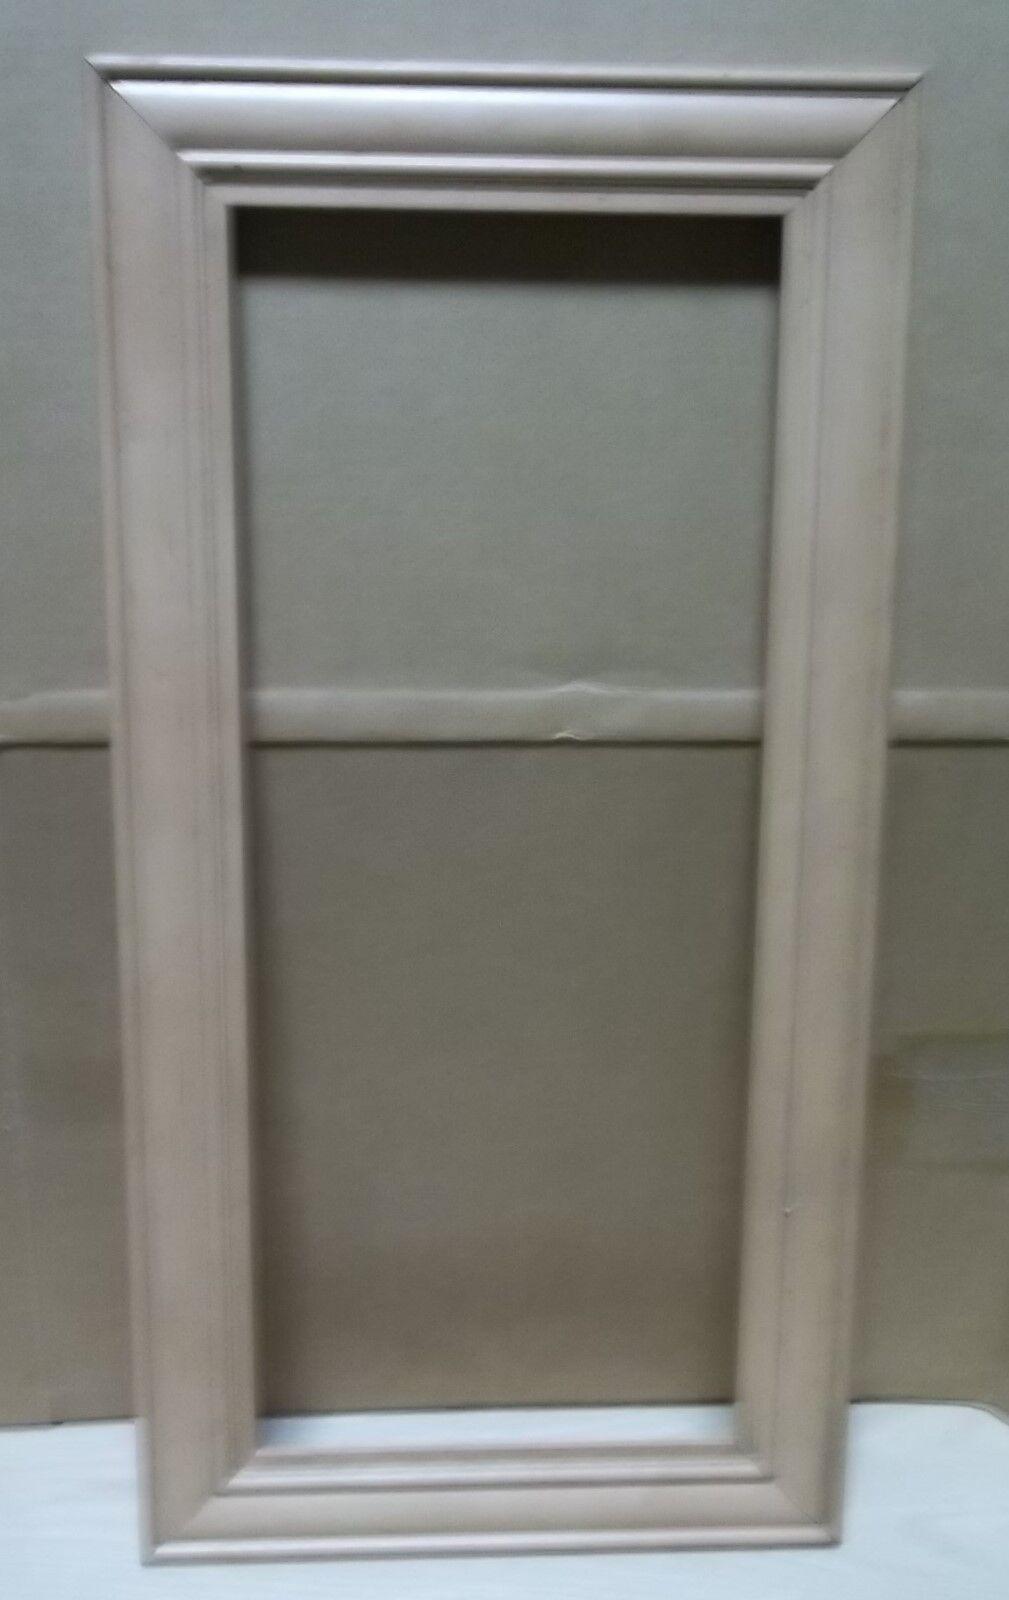 2 FRAME CABINET DOORS PAINT GRADE MAPLE OPEN FRAME, FANCY EDGE 17 3 4 X 28 3 4